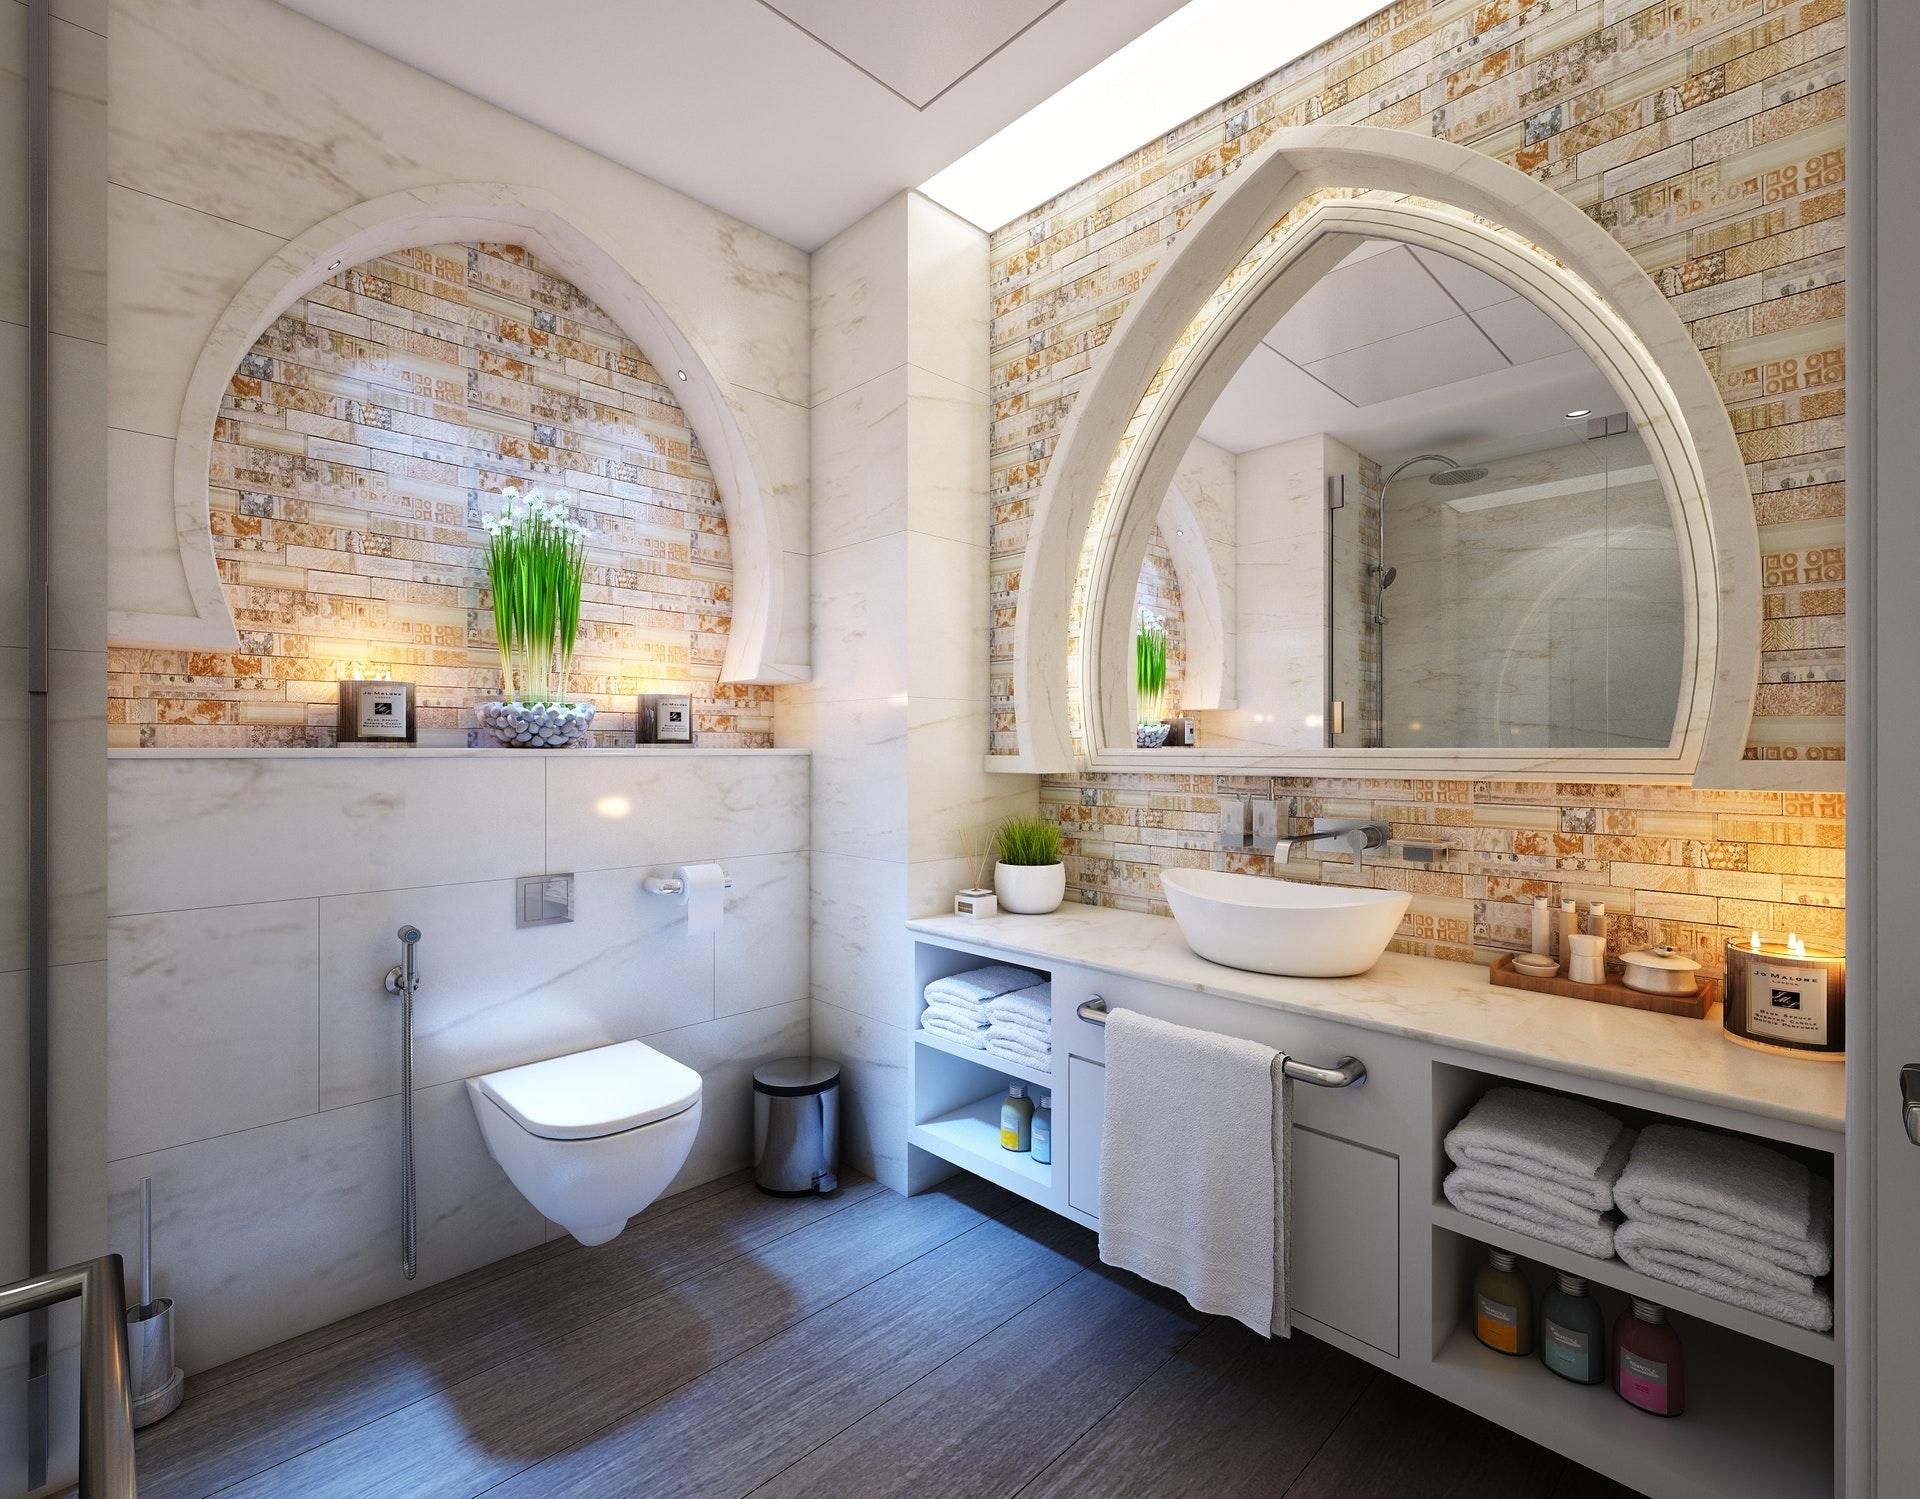 Easy Ways to Improve Your Bathroom